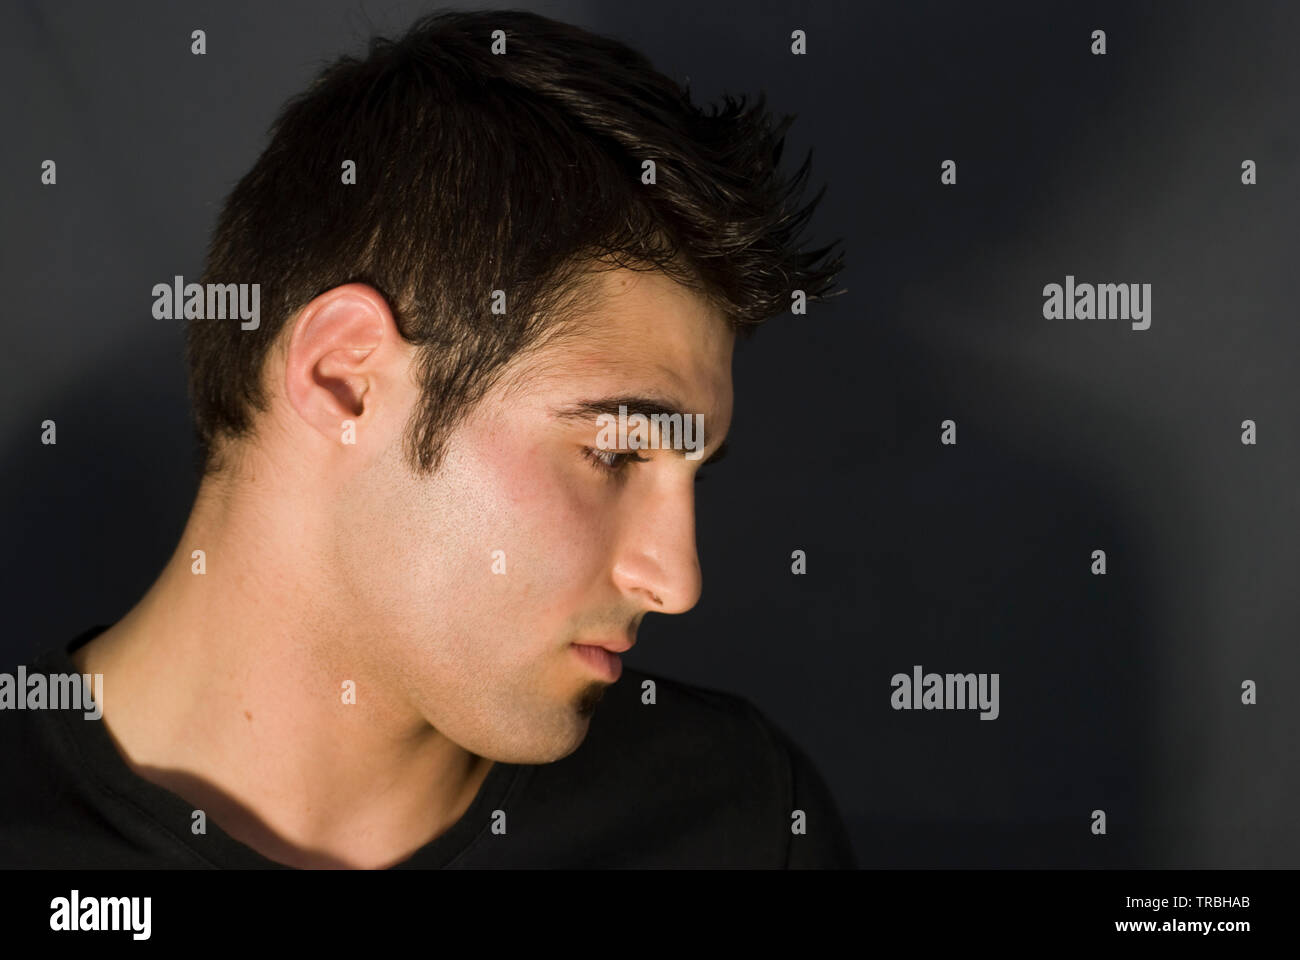 Retrato de perfil pf morena hombre. Foto de stock